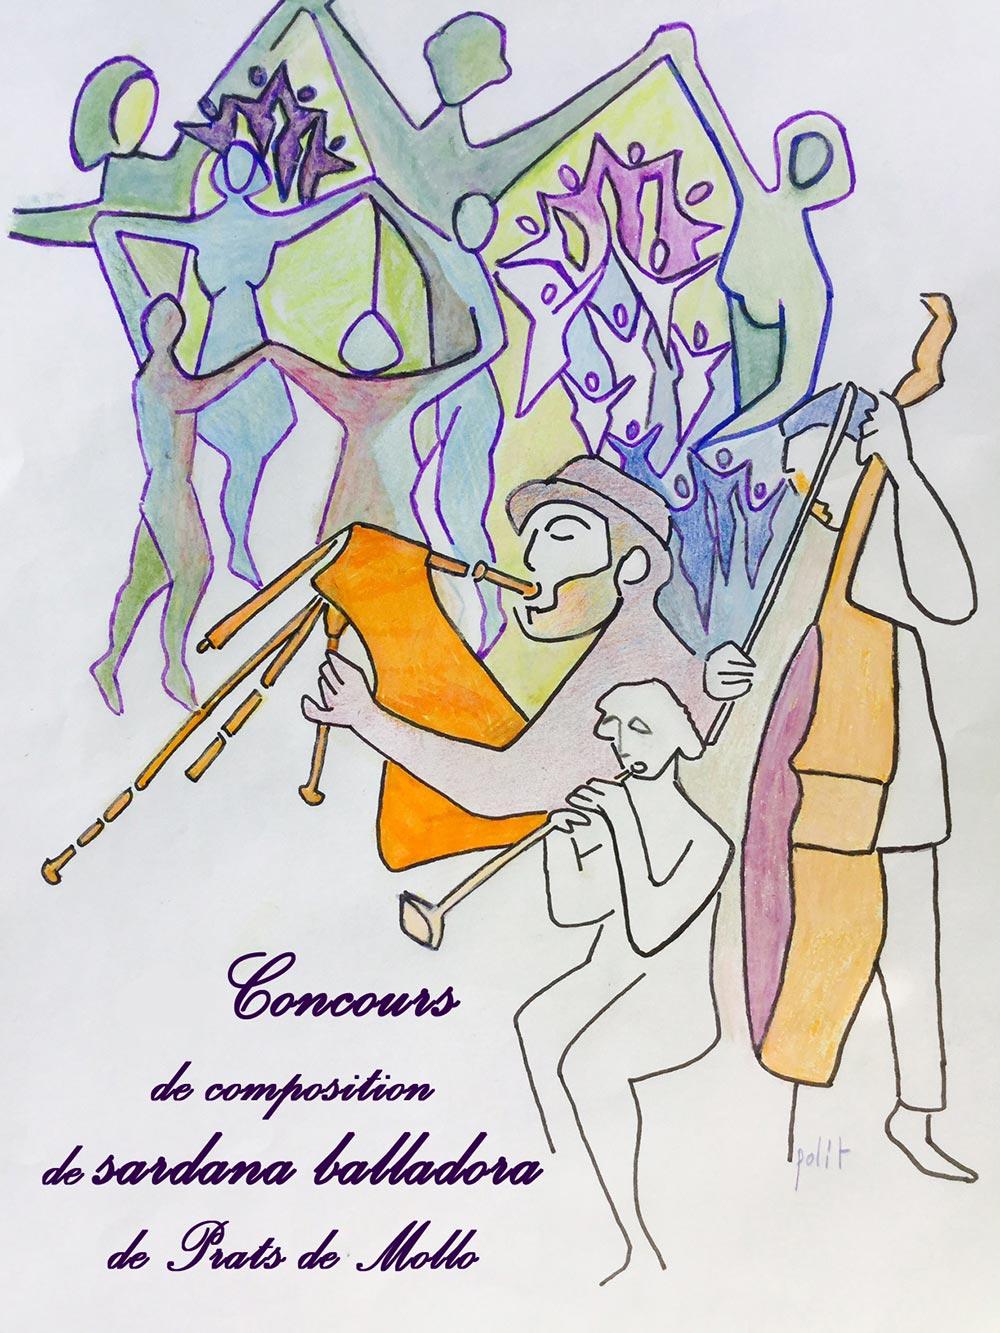 prix-de-composition-sardanes-1